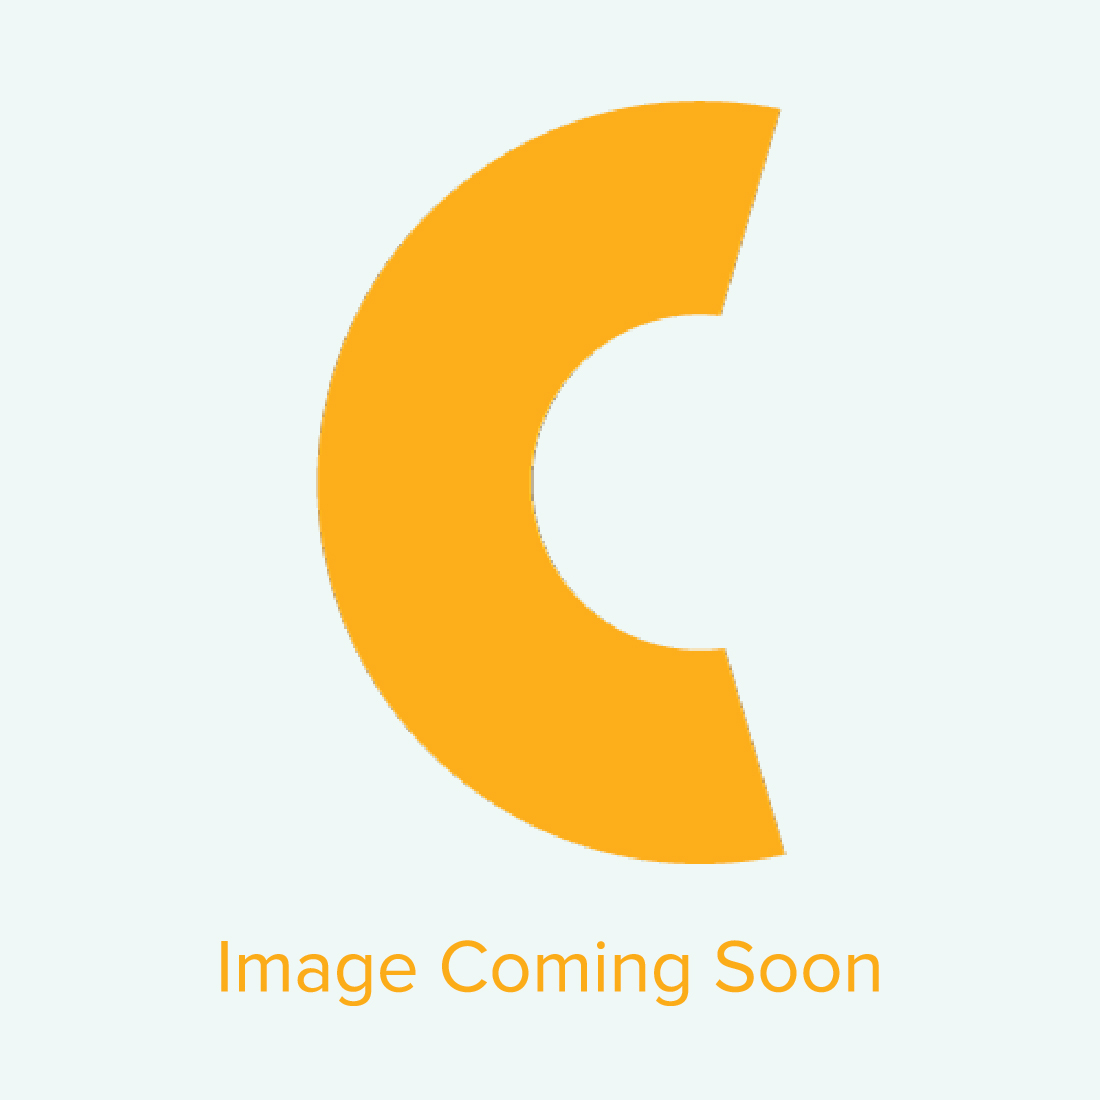 "15"" Siser EasyWeed Sub Block Heat Transfer Vinyl -  10 yard - Barcelona Yellow"